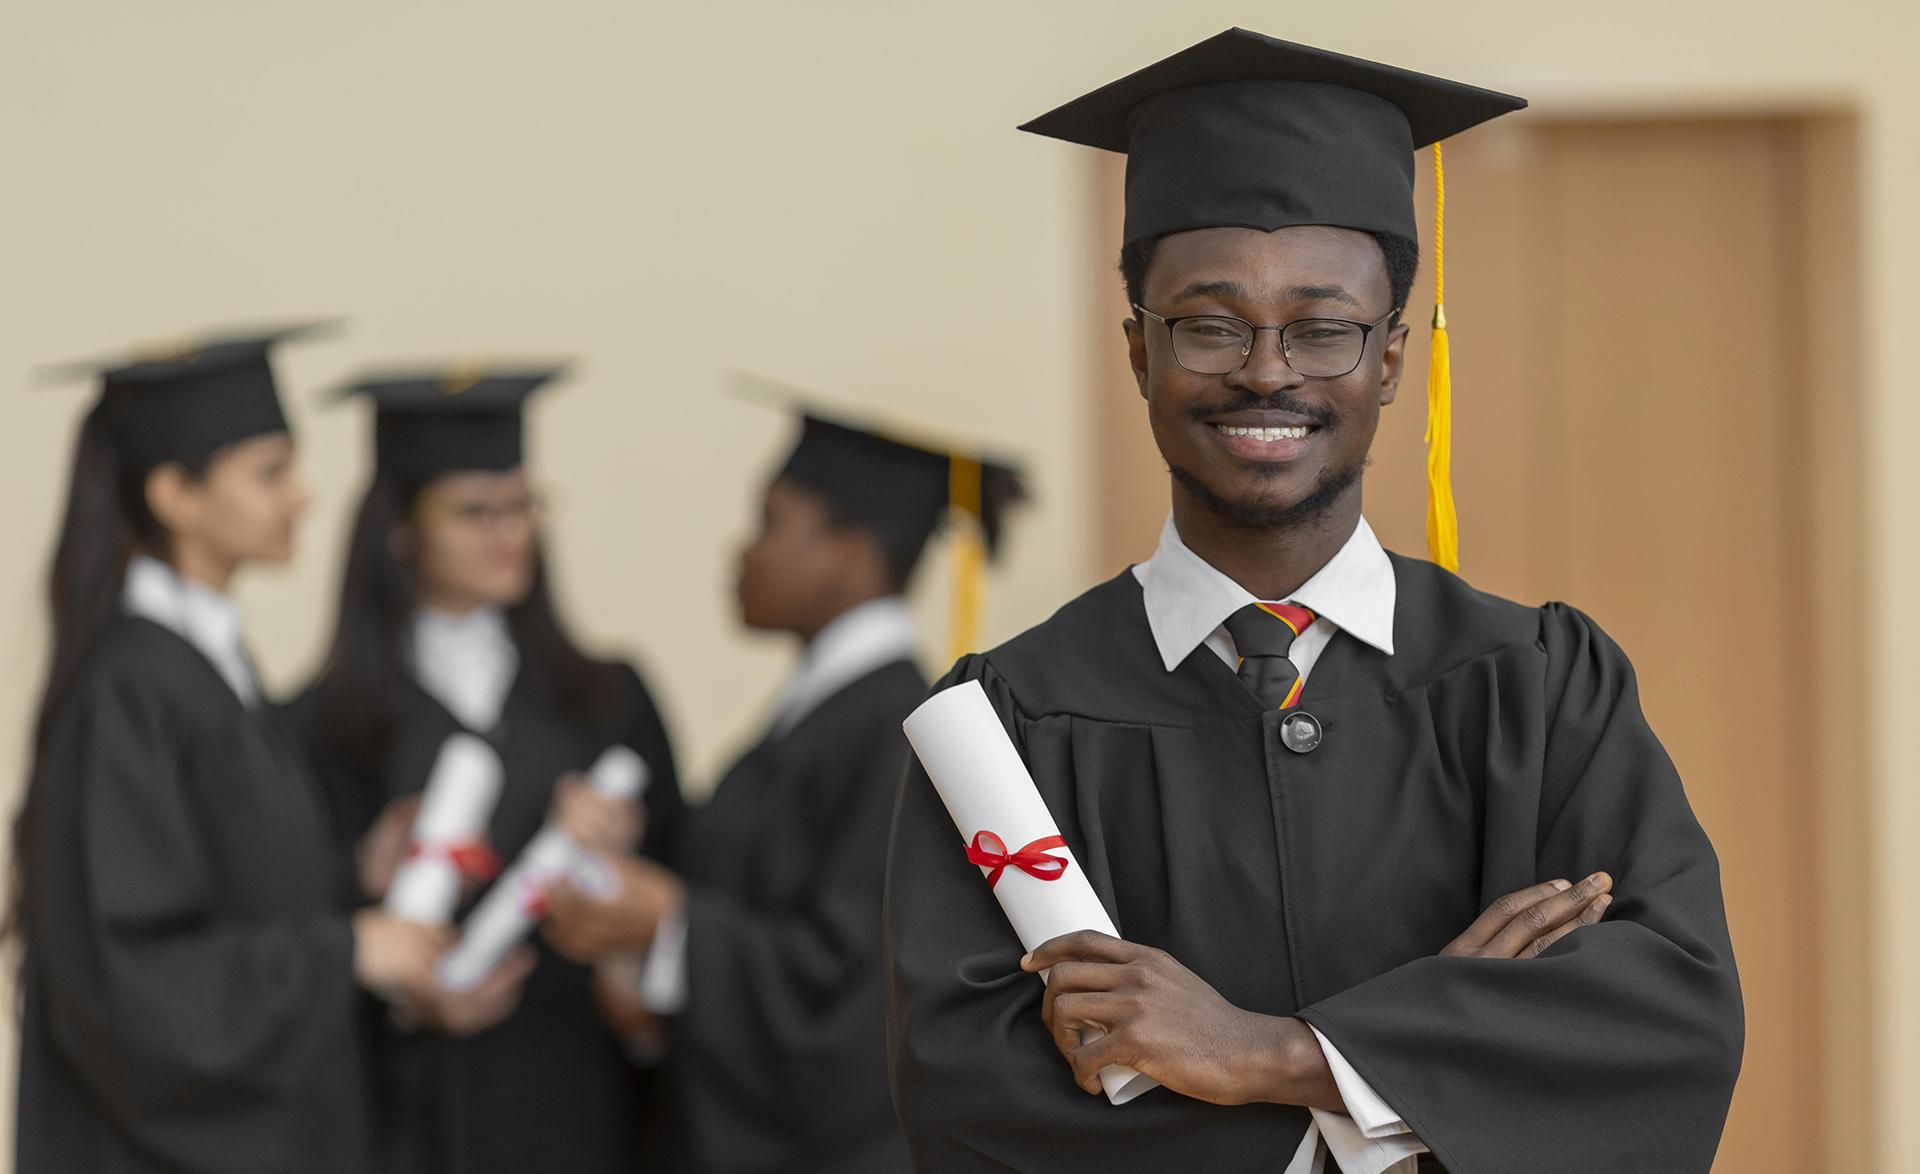 medium-shot-people-graduating